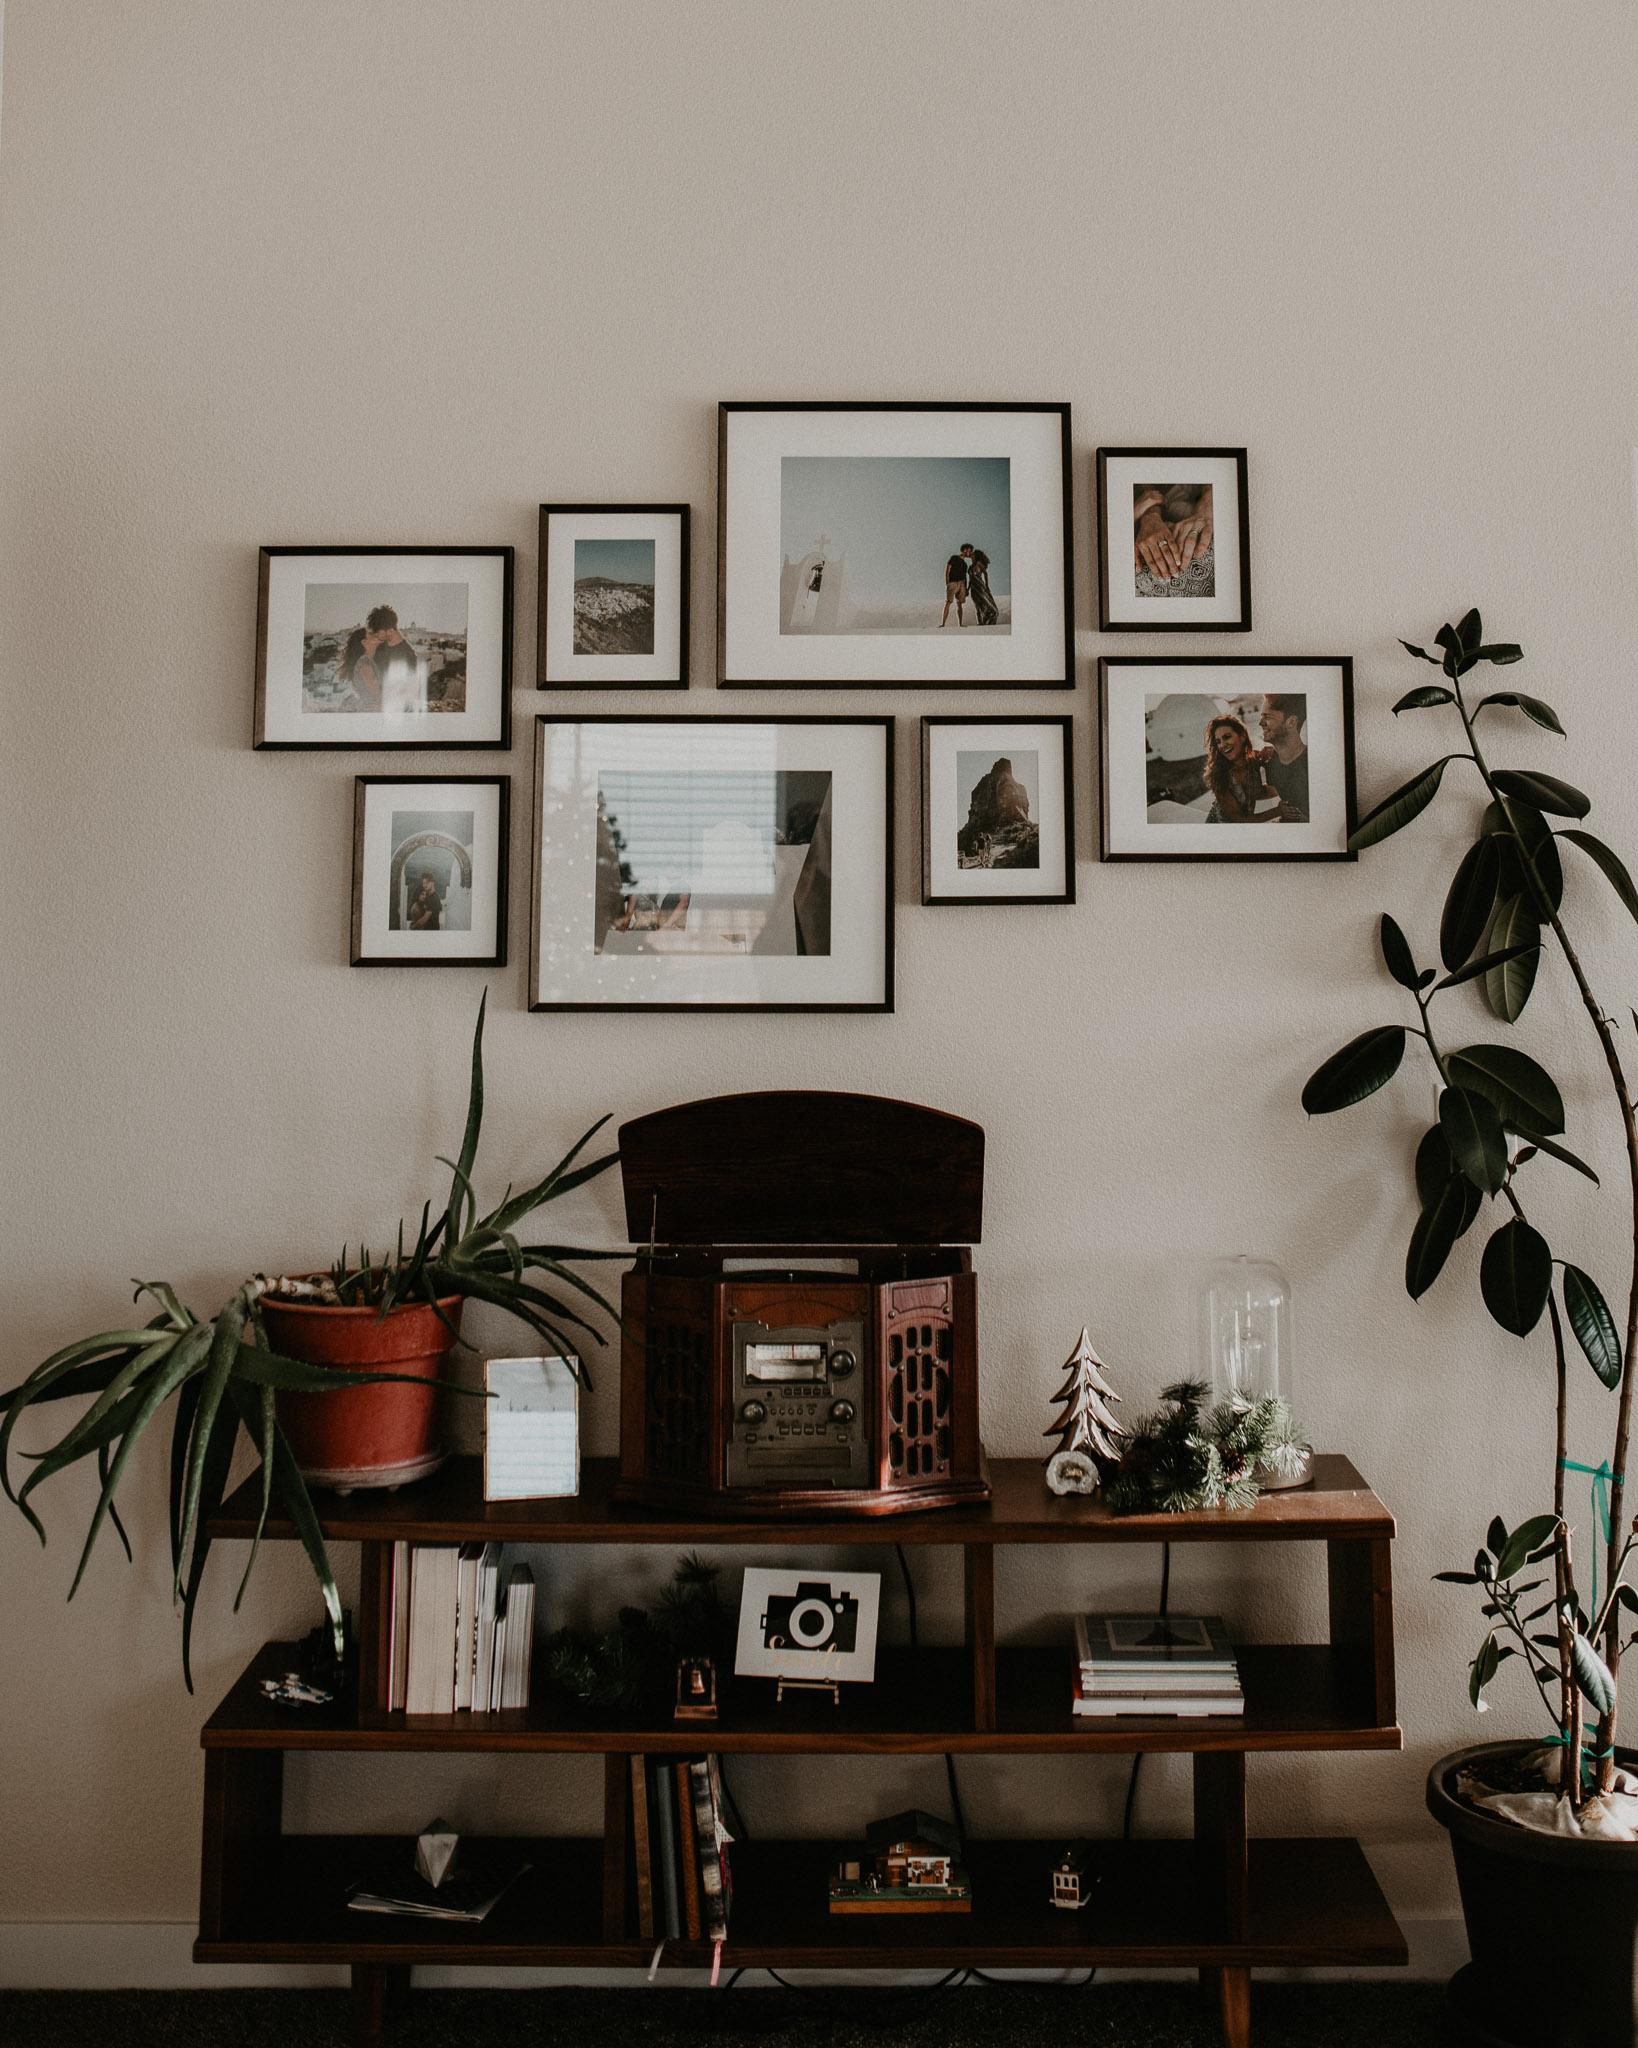 Boise Boudoir Photographer Boise Senior Photographer Makayla Madden Photography Mid Century Modern Ashlyn Bookshelf World Market Aloe Plant Record Player Vinyl Rubber Tree